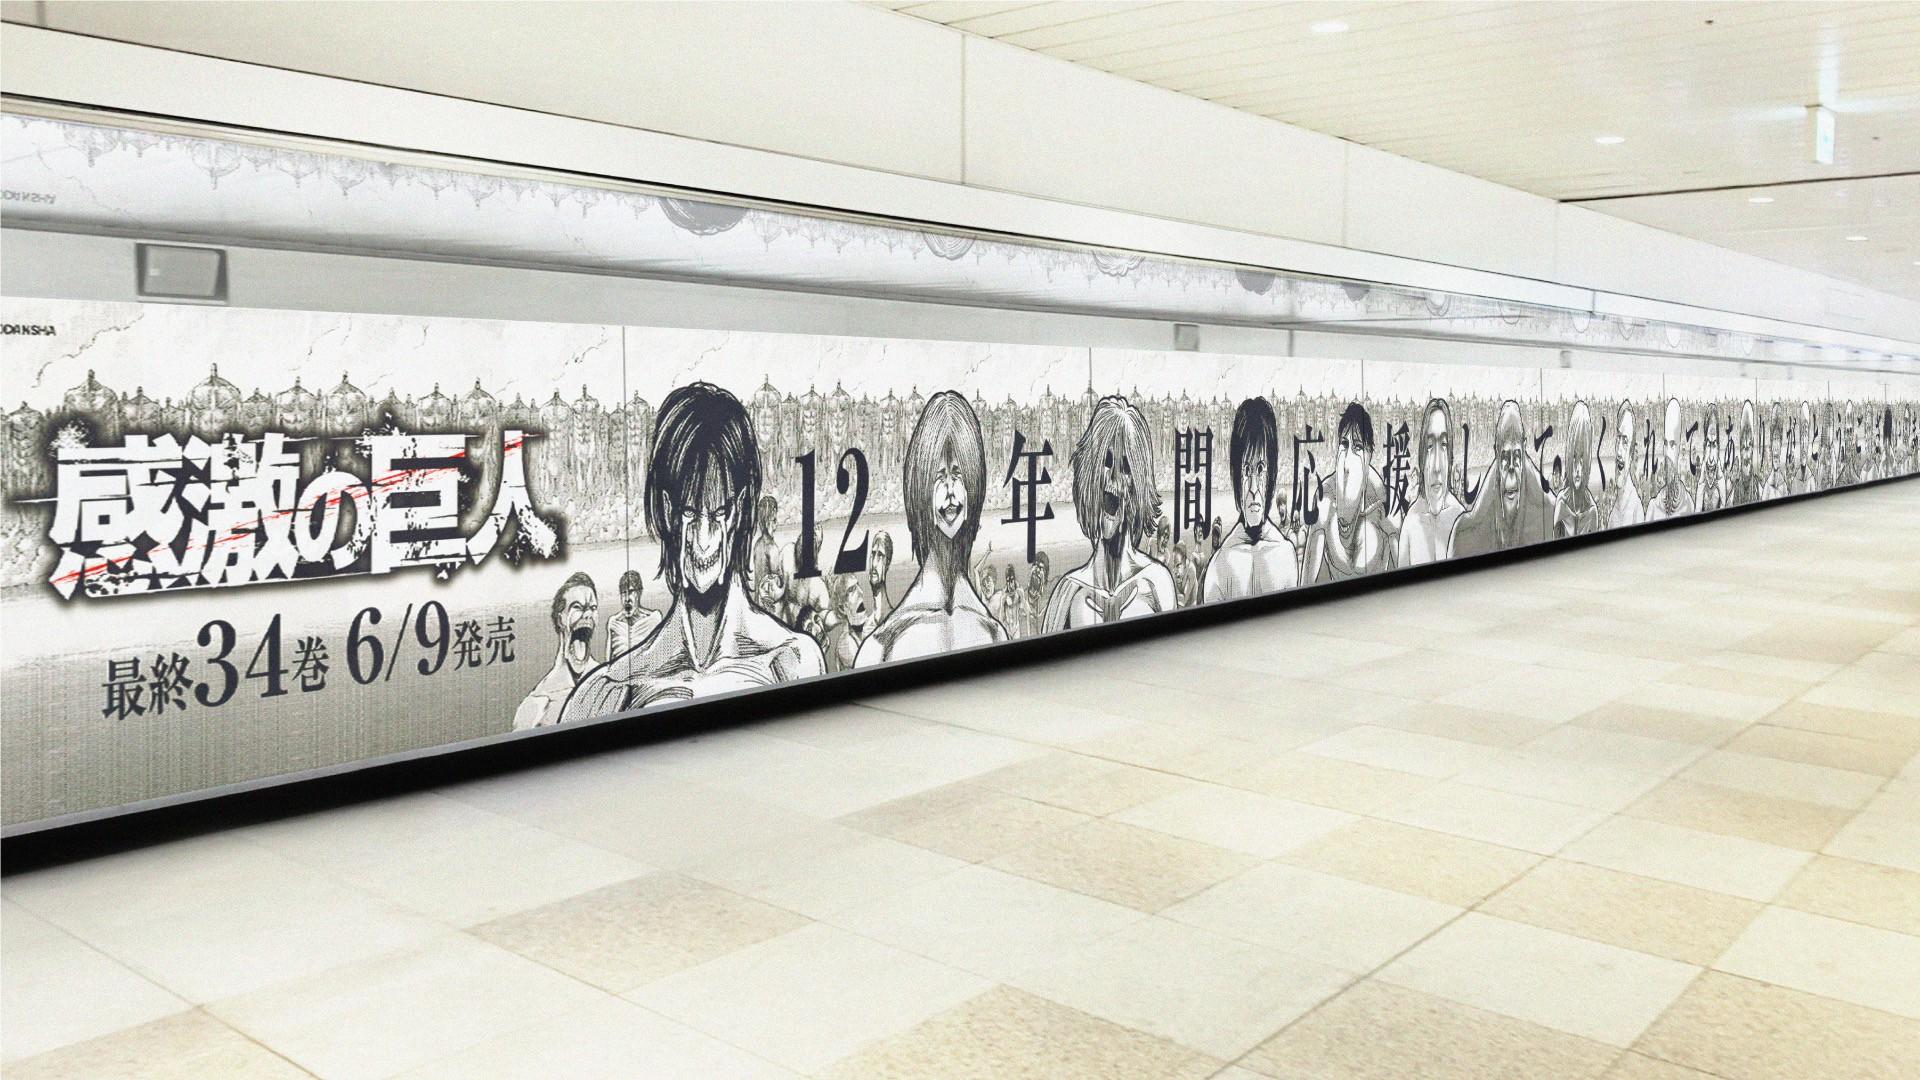 Shingeki no Kyojin coloca un espectacular anuncio para su volumen final —  Kudasai